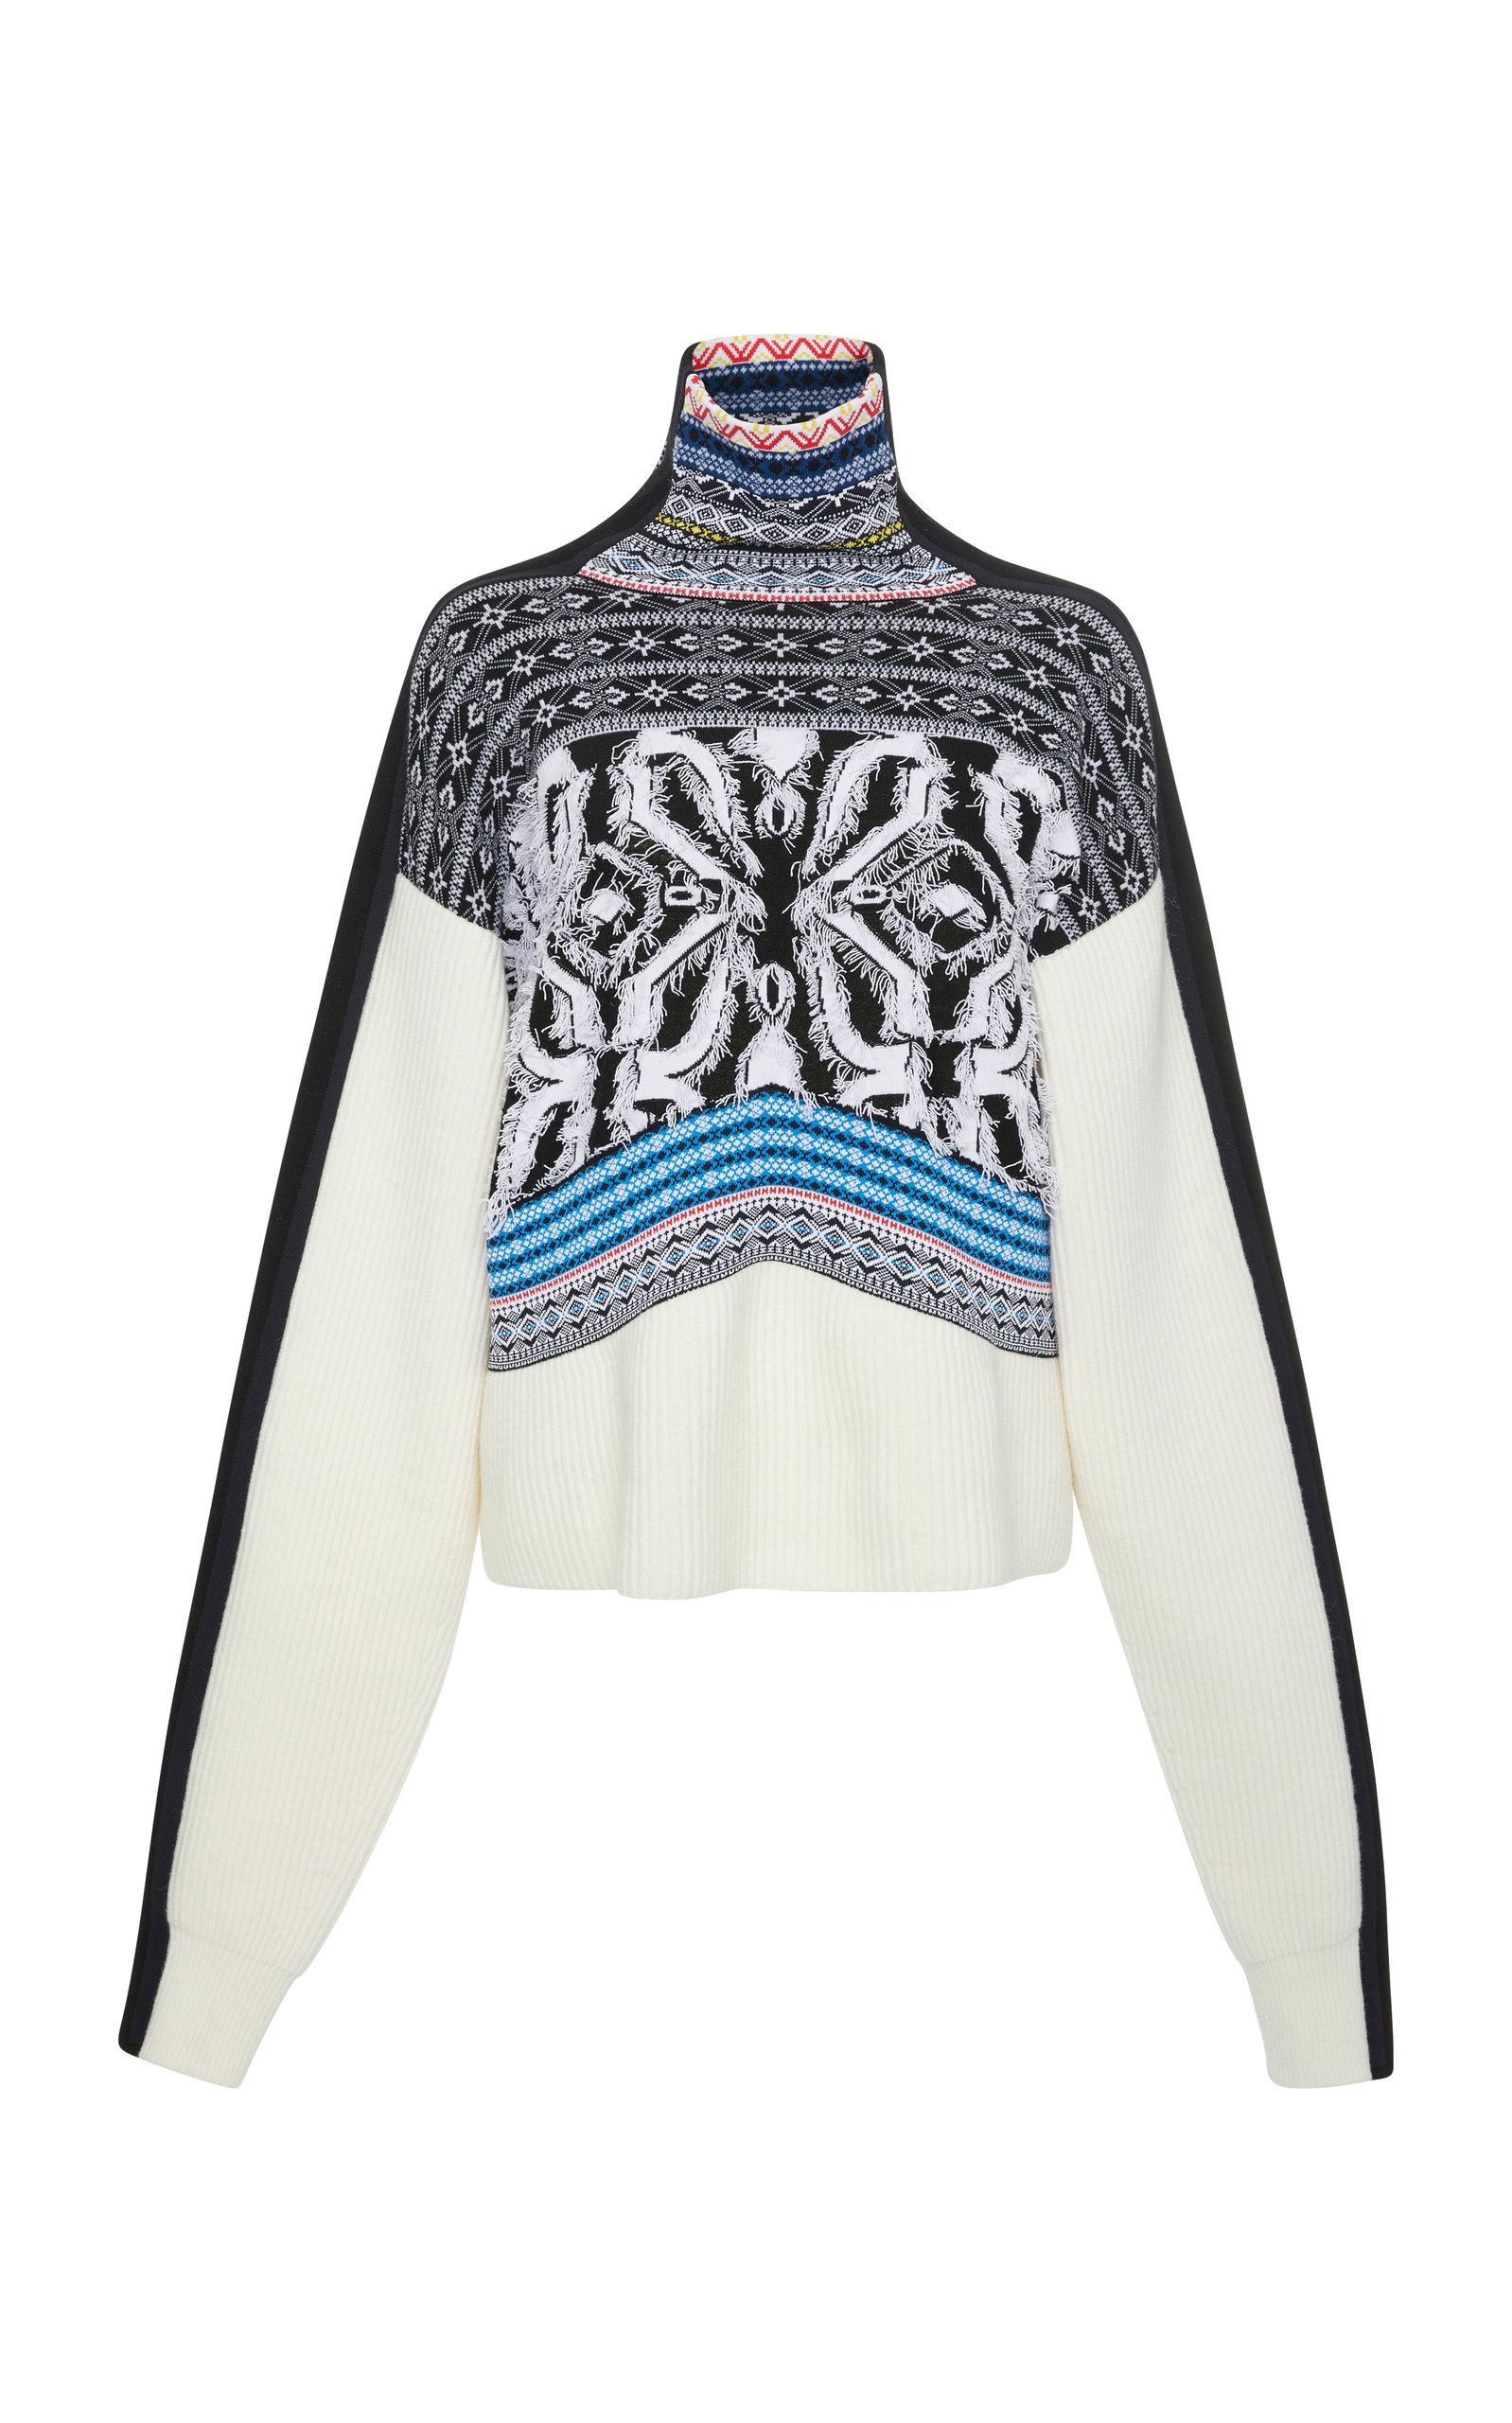 SPORTMAX Fair Isle Wool-Blend Turtleneck Sweater in White